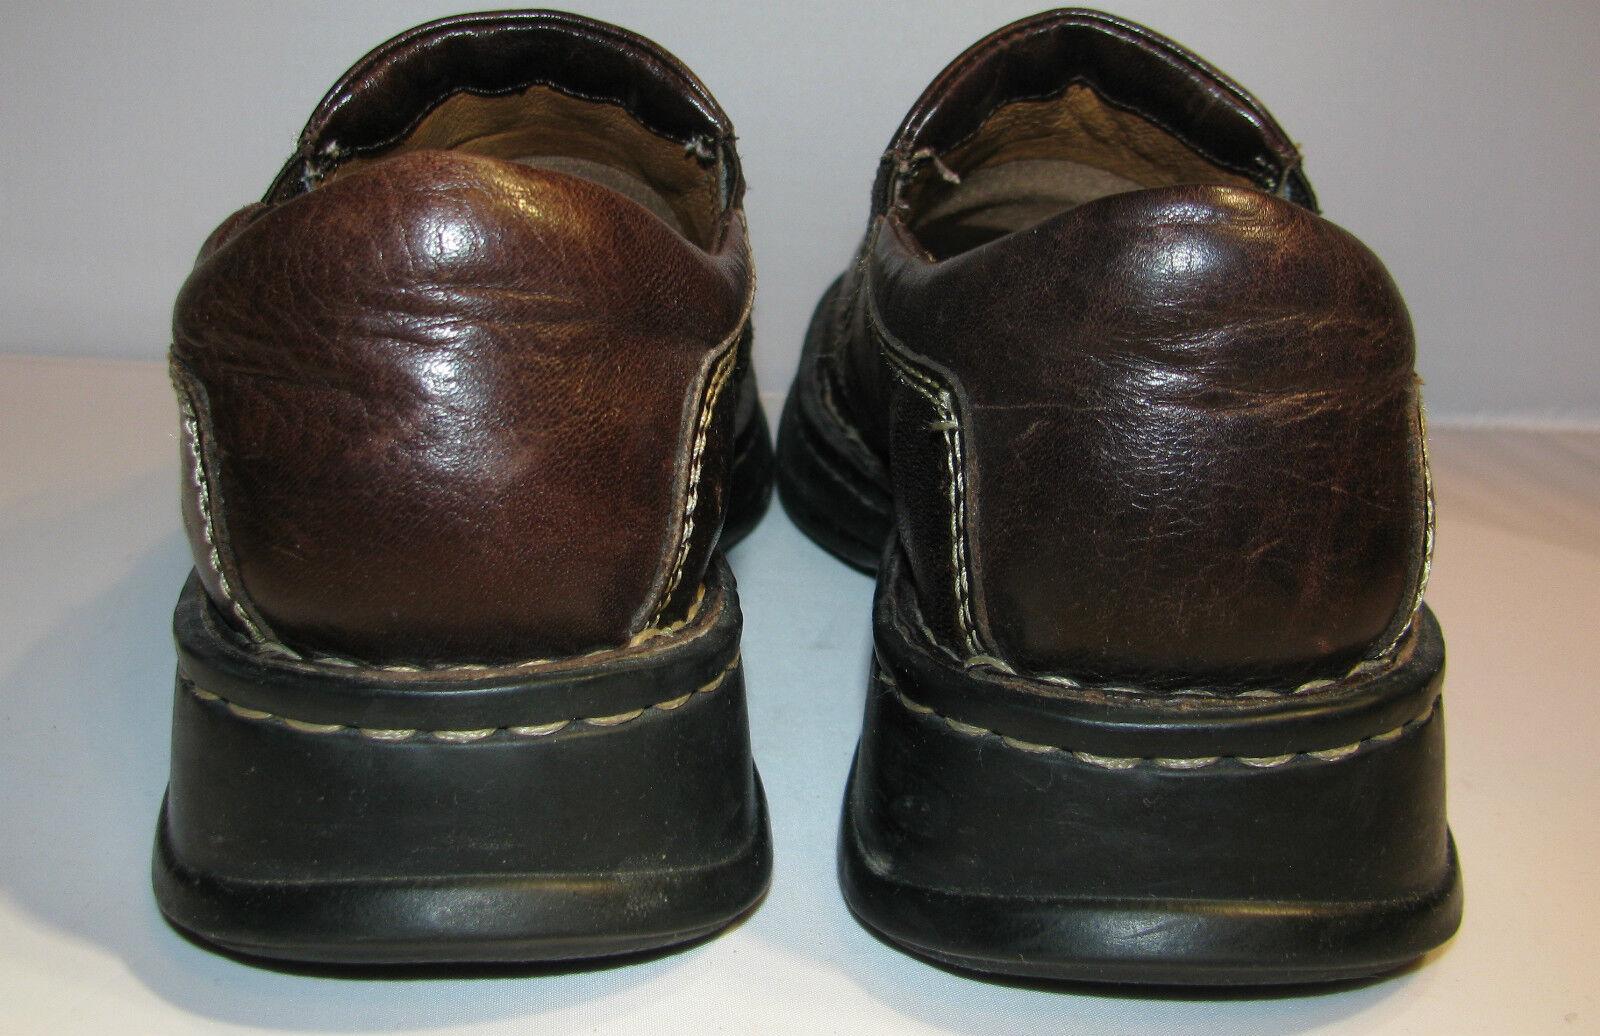 BORN BROWN LEATHER SLIP SLIP SLIP ON COMFY Scarpe SZ 8M - EUC 351749